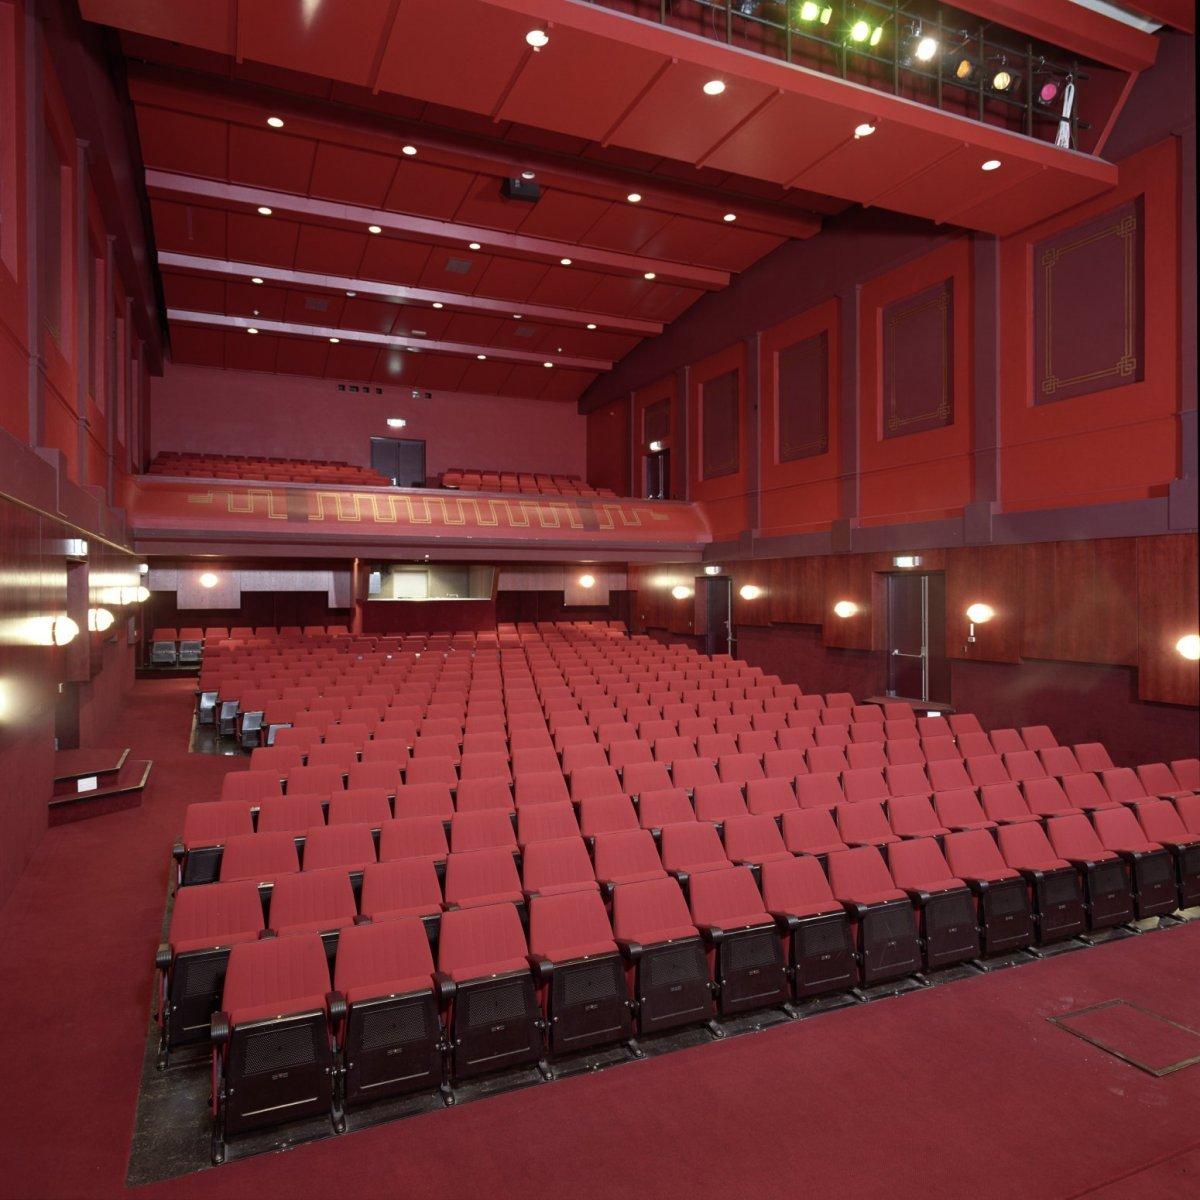 File:Interieur, overzicht theaterzaal - Rijssen - 20397531 - RCE.jpg ...